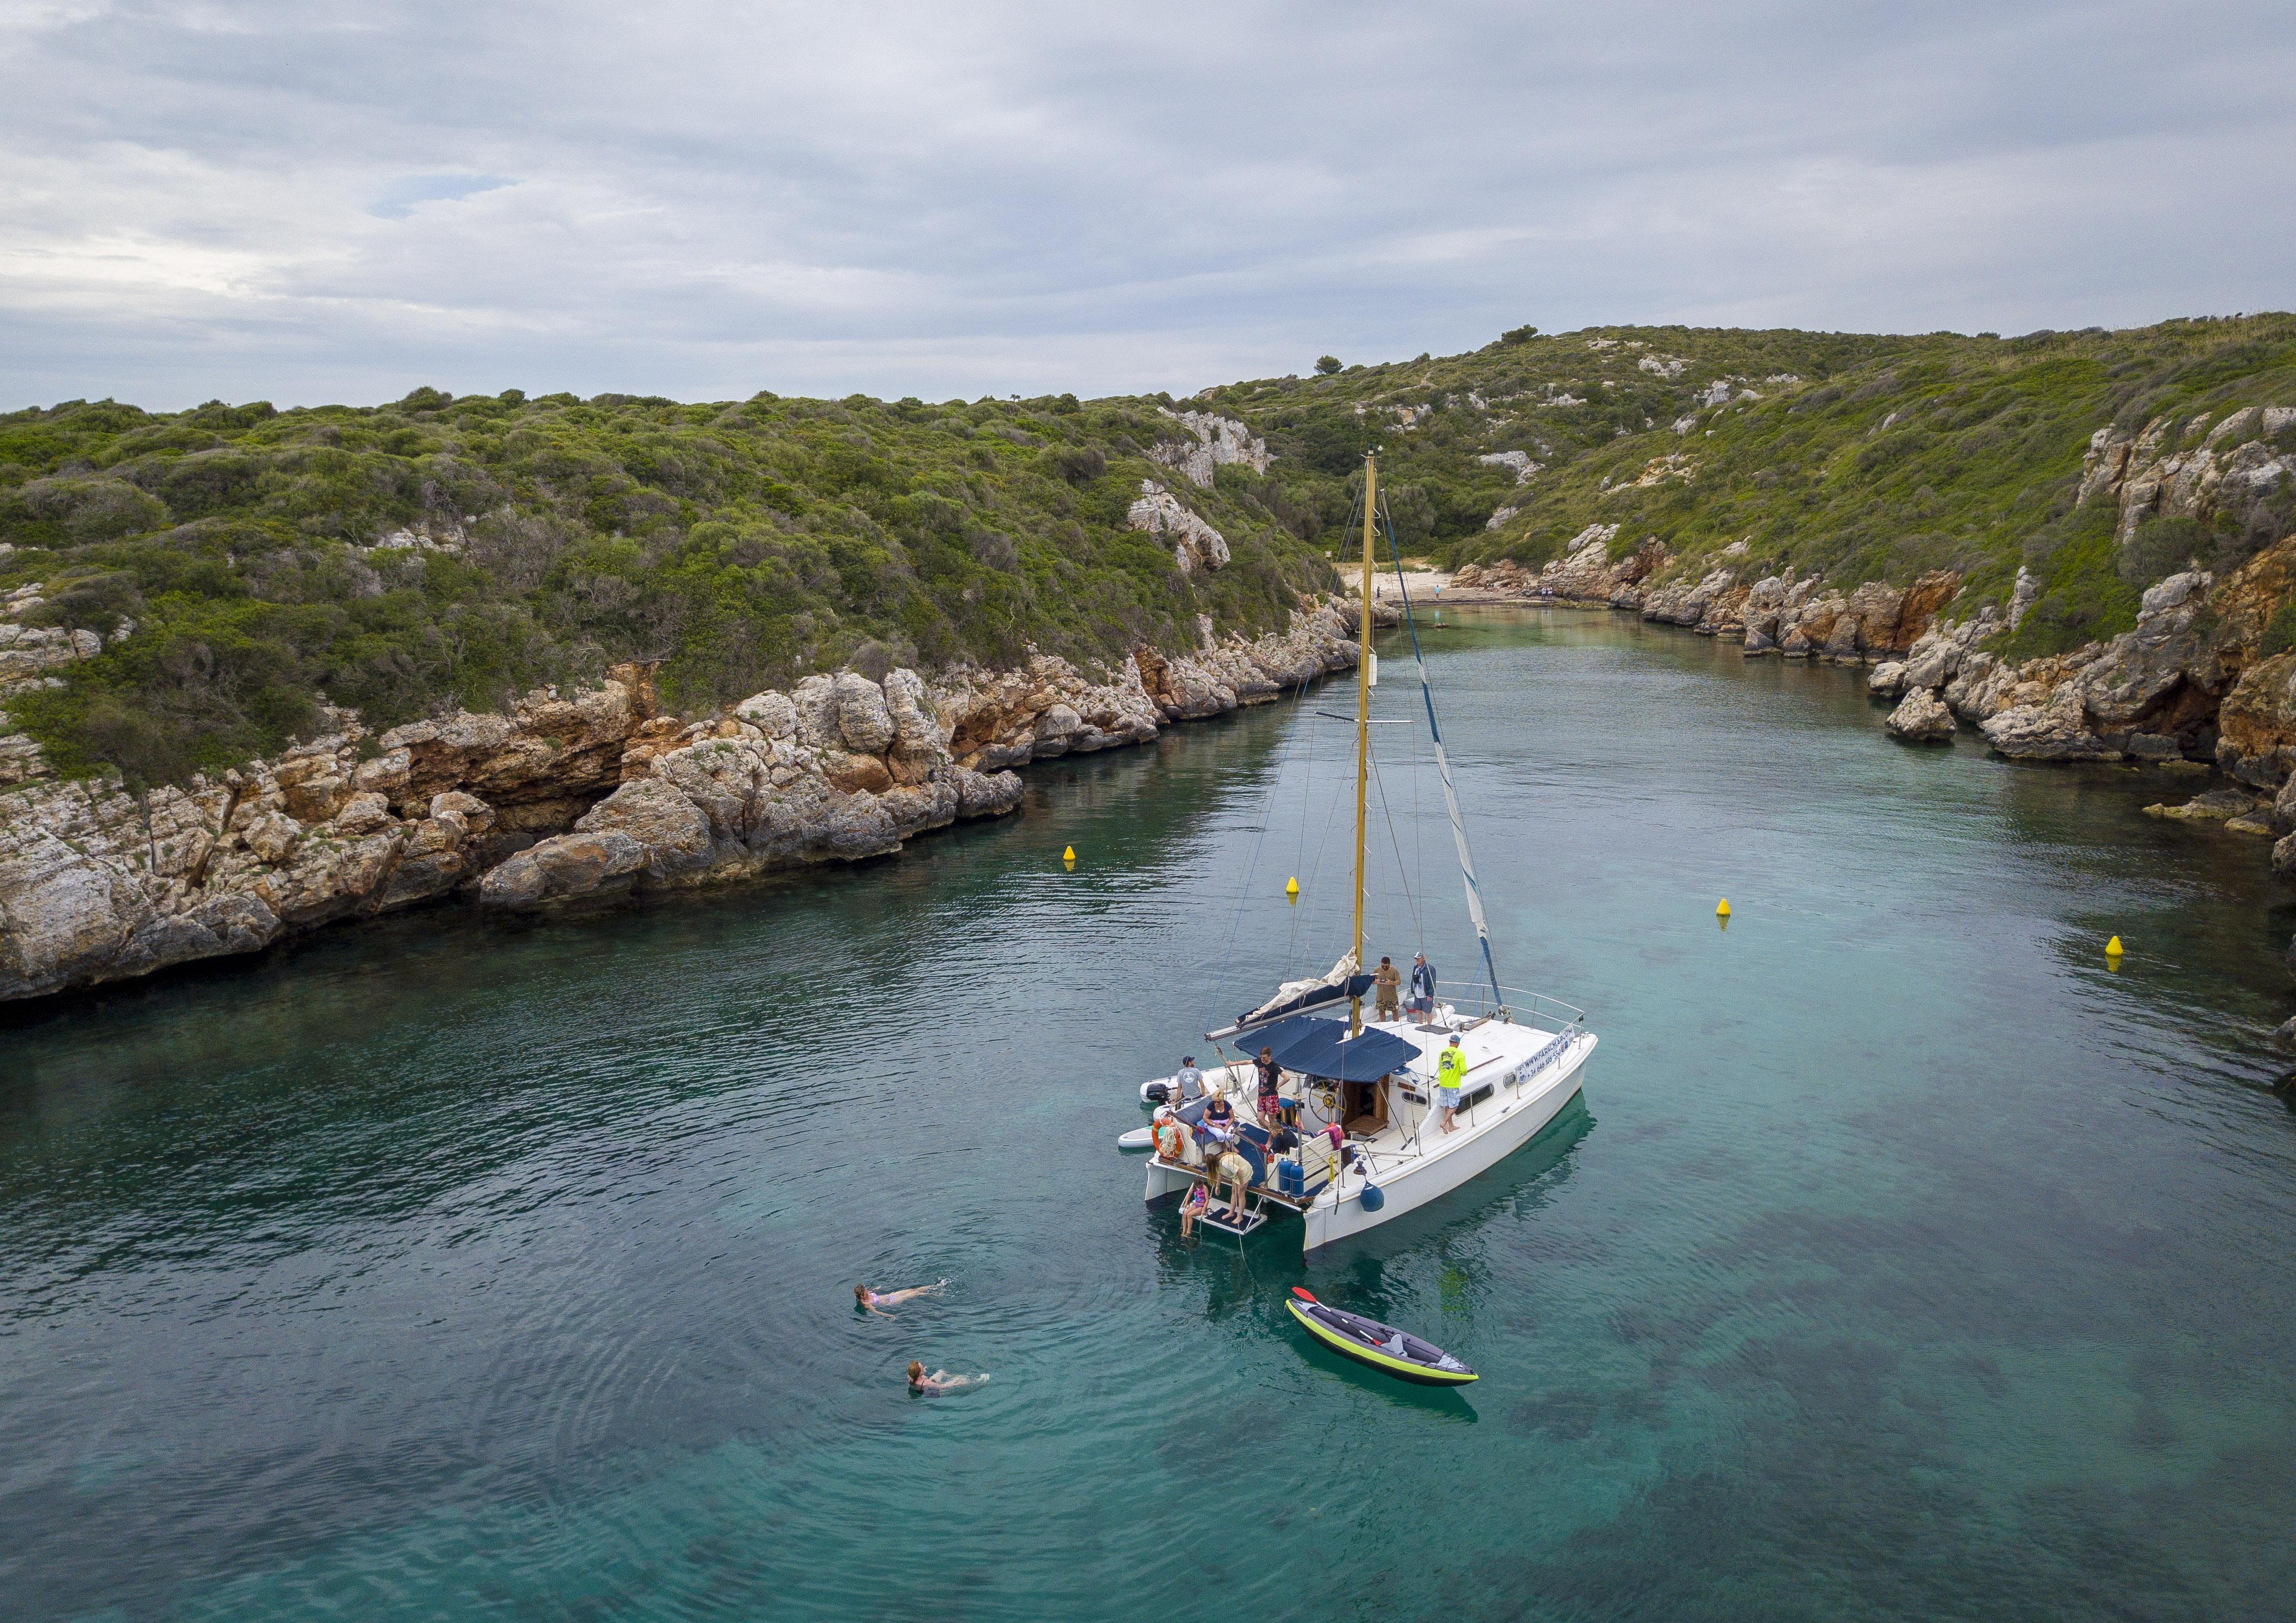 Catermaran in a Menorcan cove